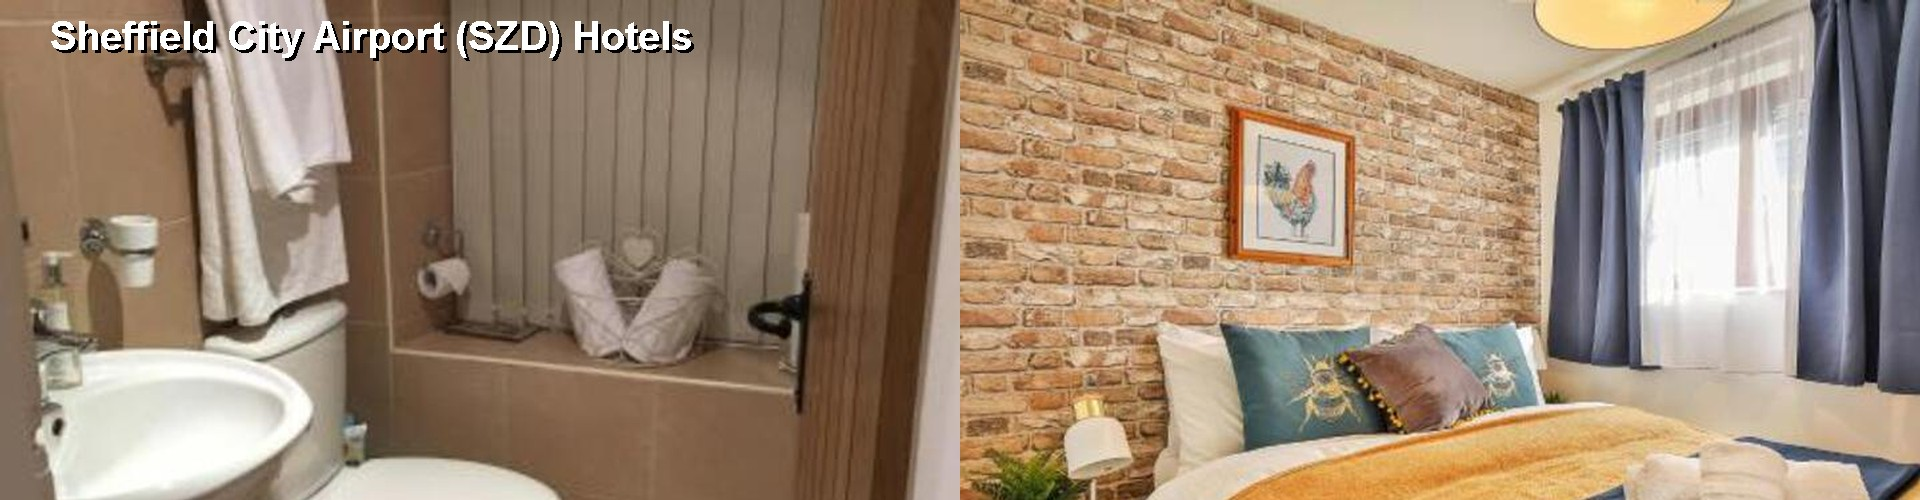 5 Best Hotels Near Sheffield City Airport Szd